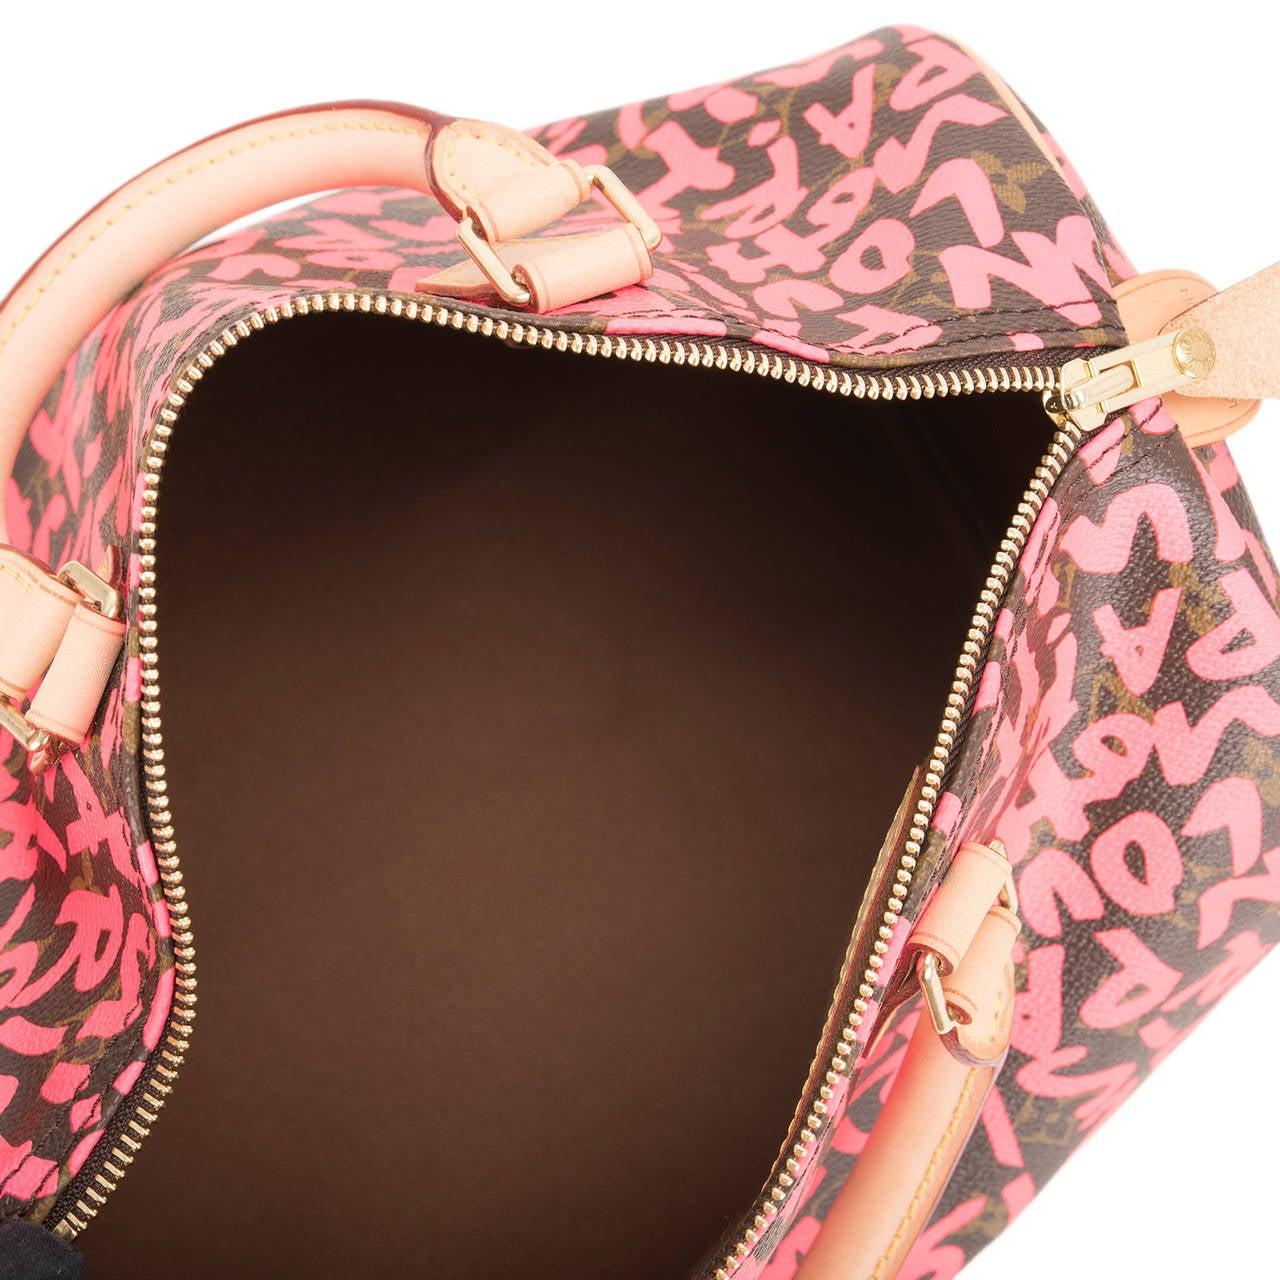 Louis Vuitton Fuchsia Pink Monogram Graffiti Speedy 30 For Sale 2